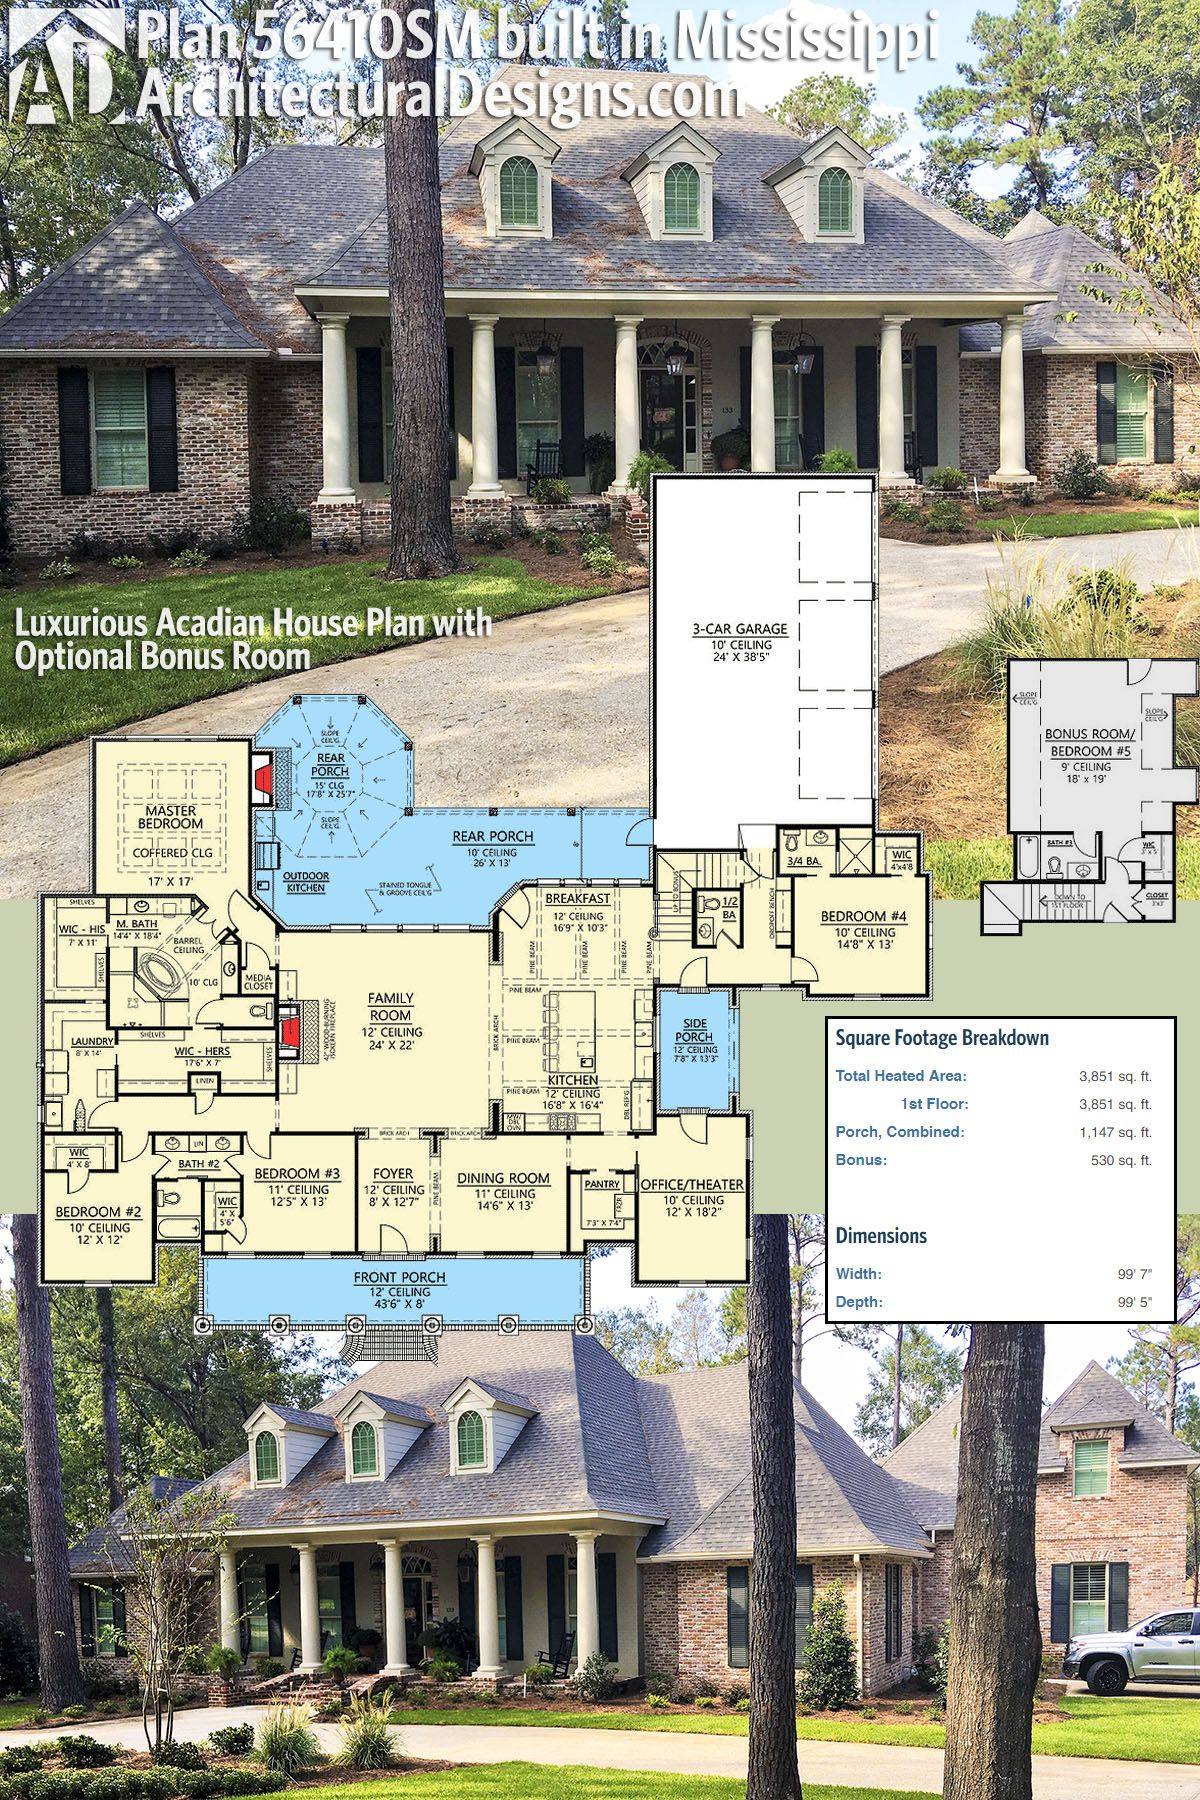 Plan 860011mcd 4 Bed Acadian House Plan With 3 Car Garage